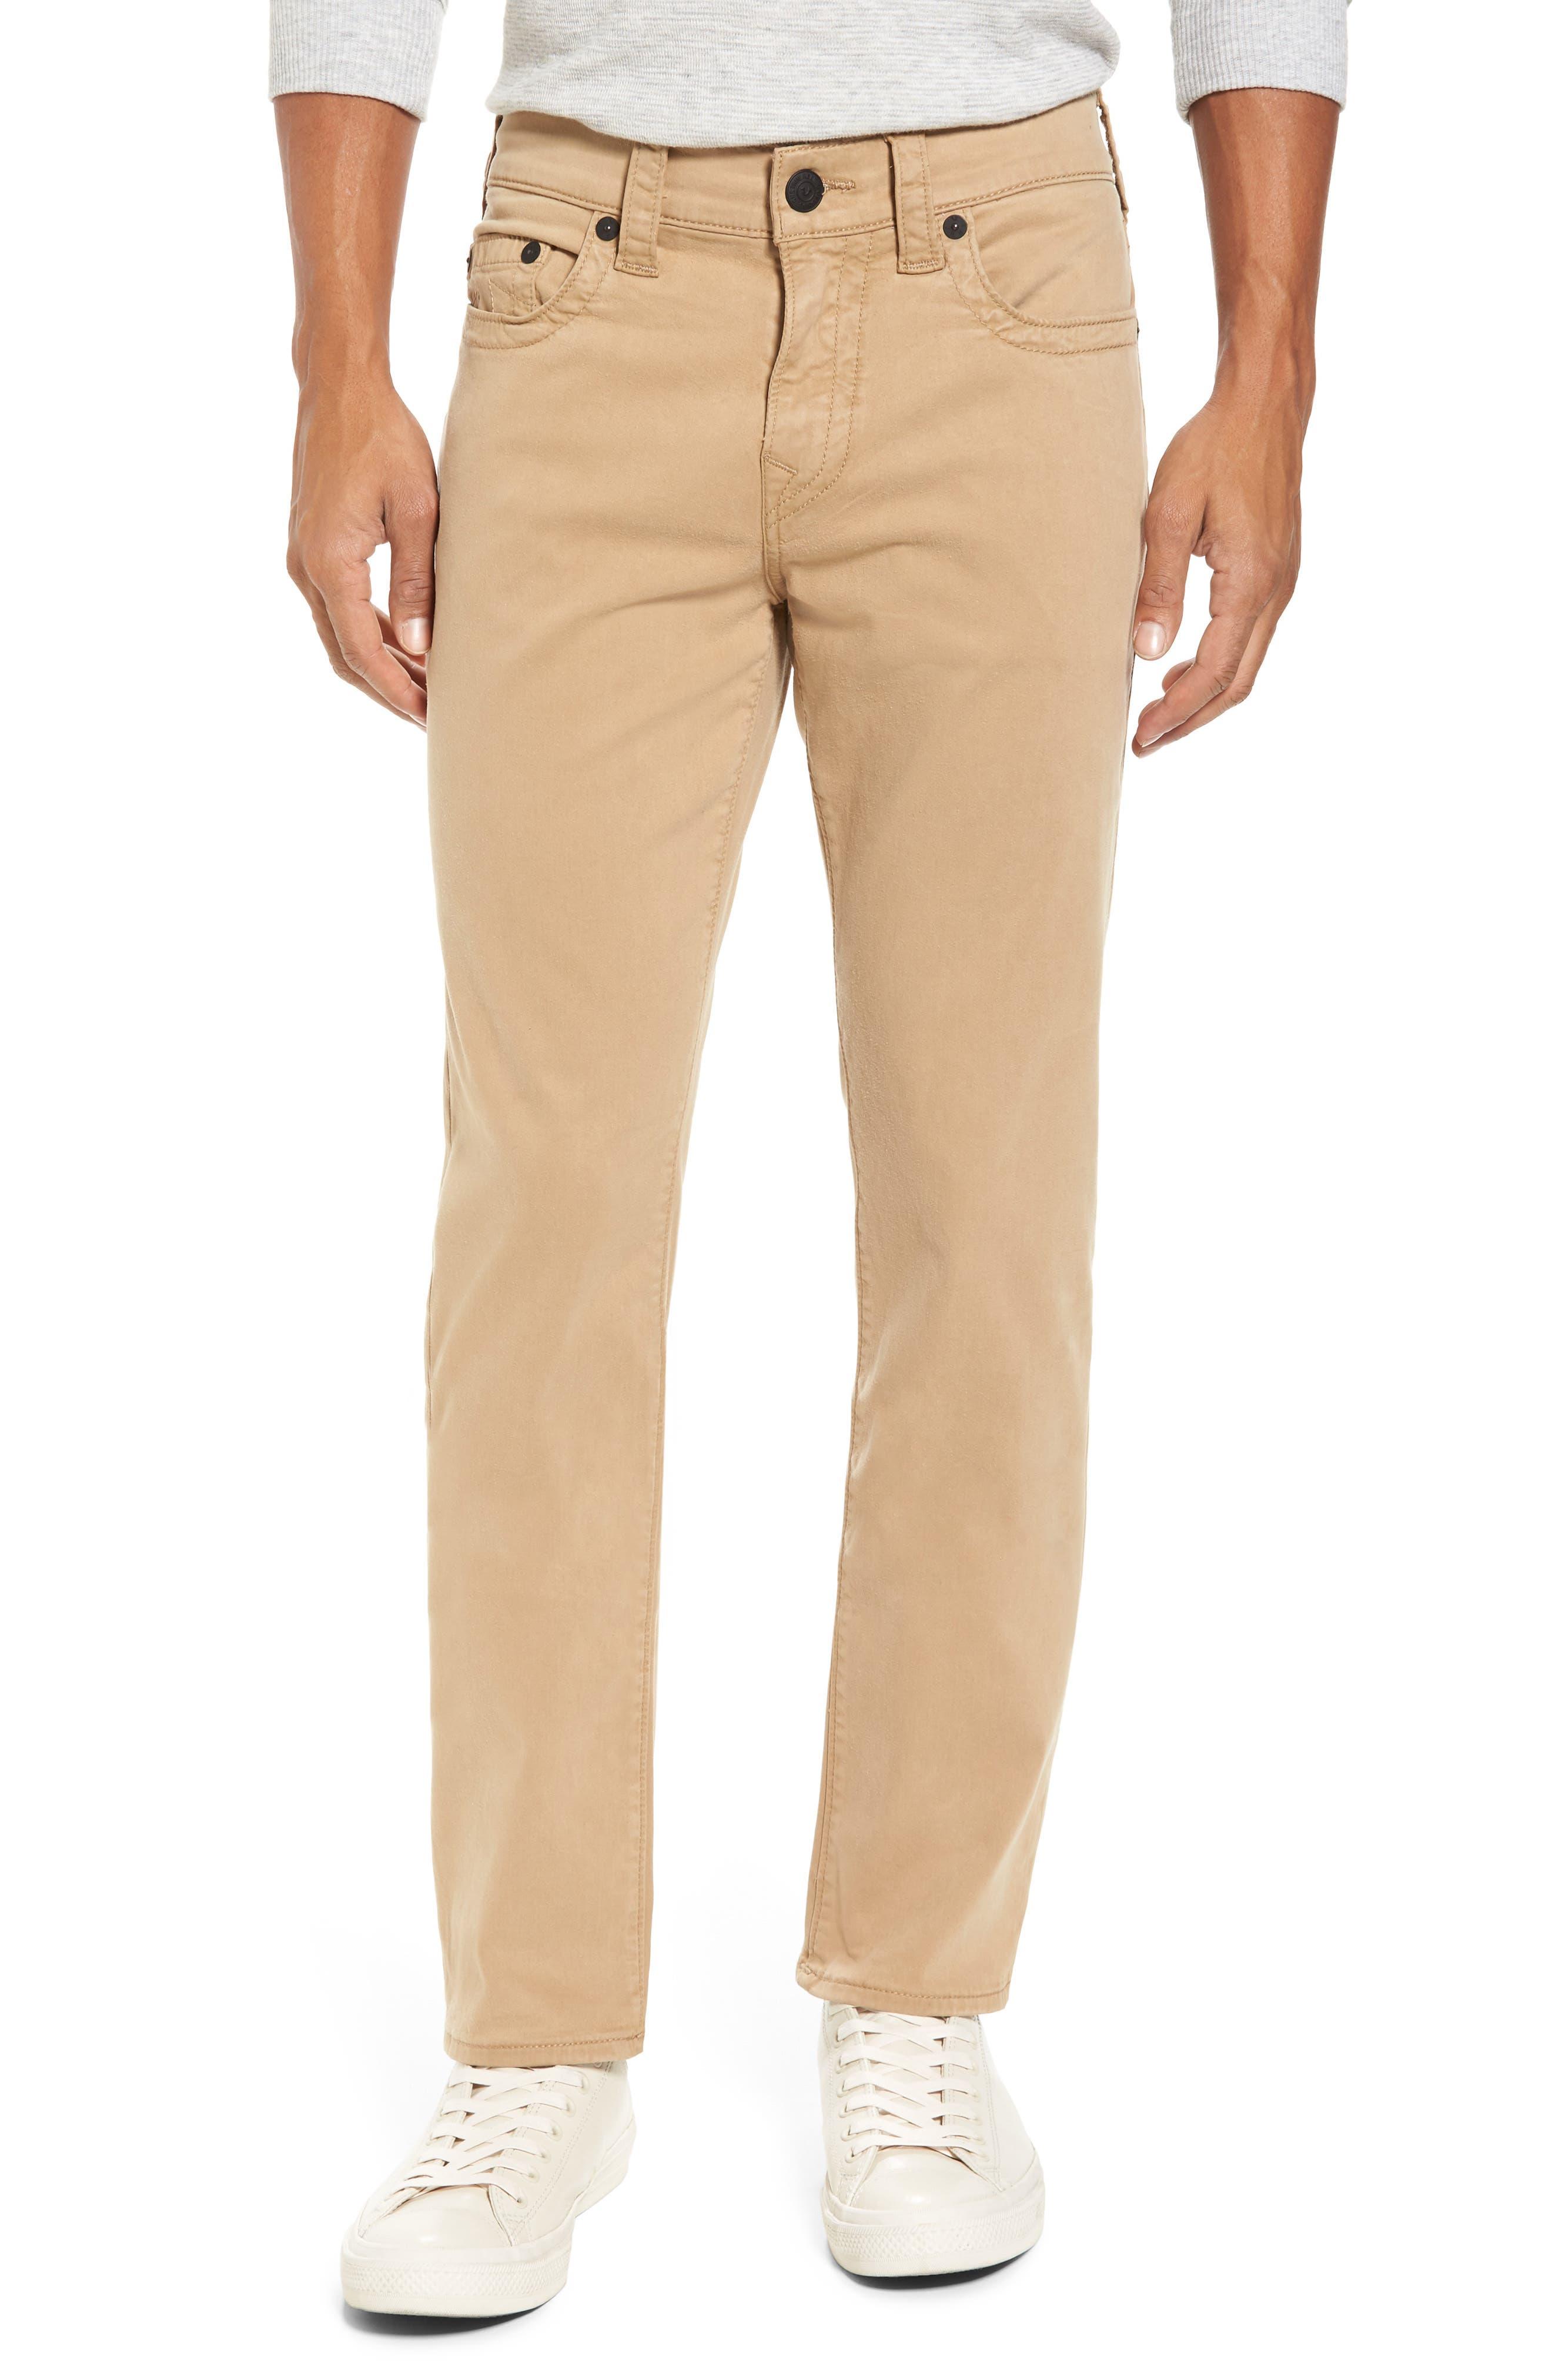 True Religion Brand Jeans Geno Straight Leg Jeans (Incense)